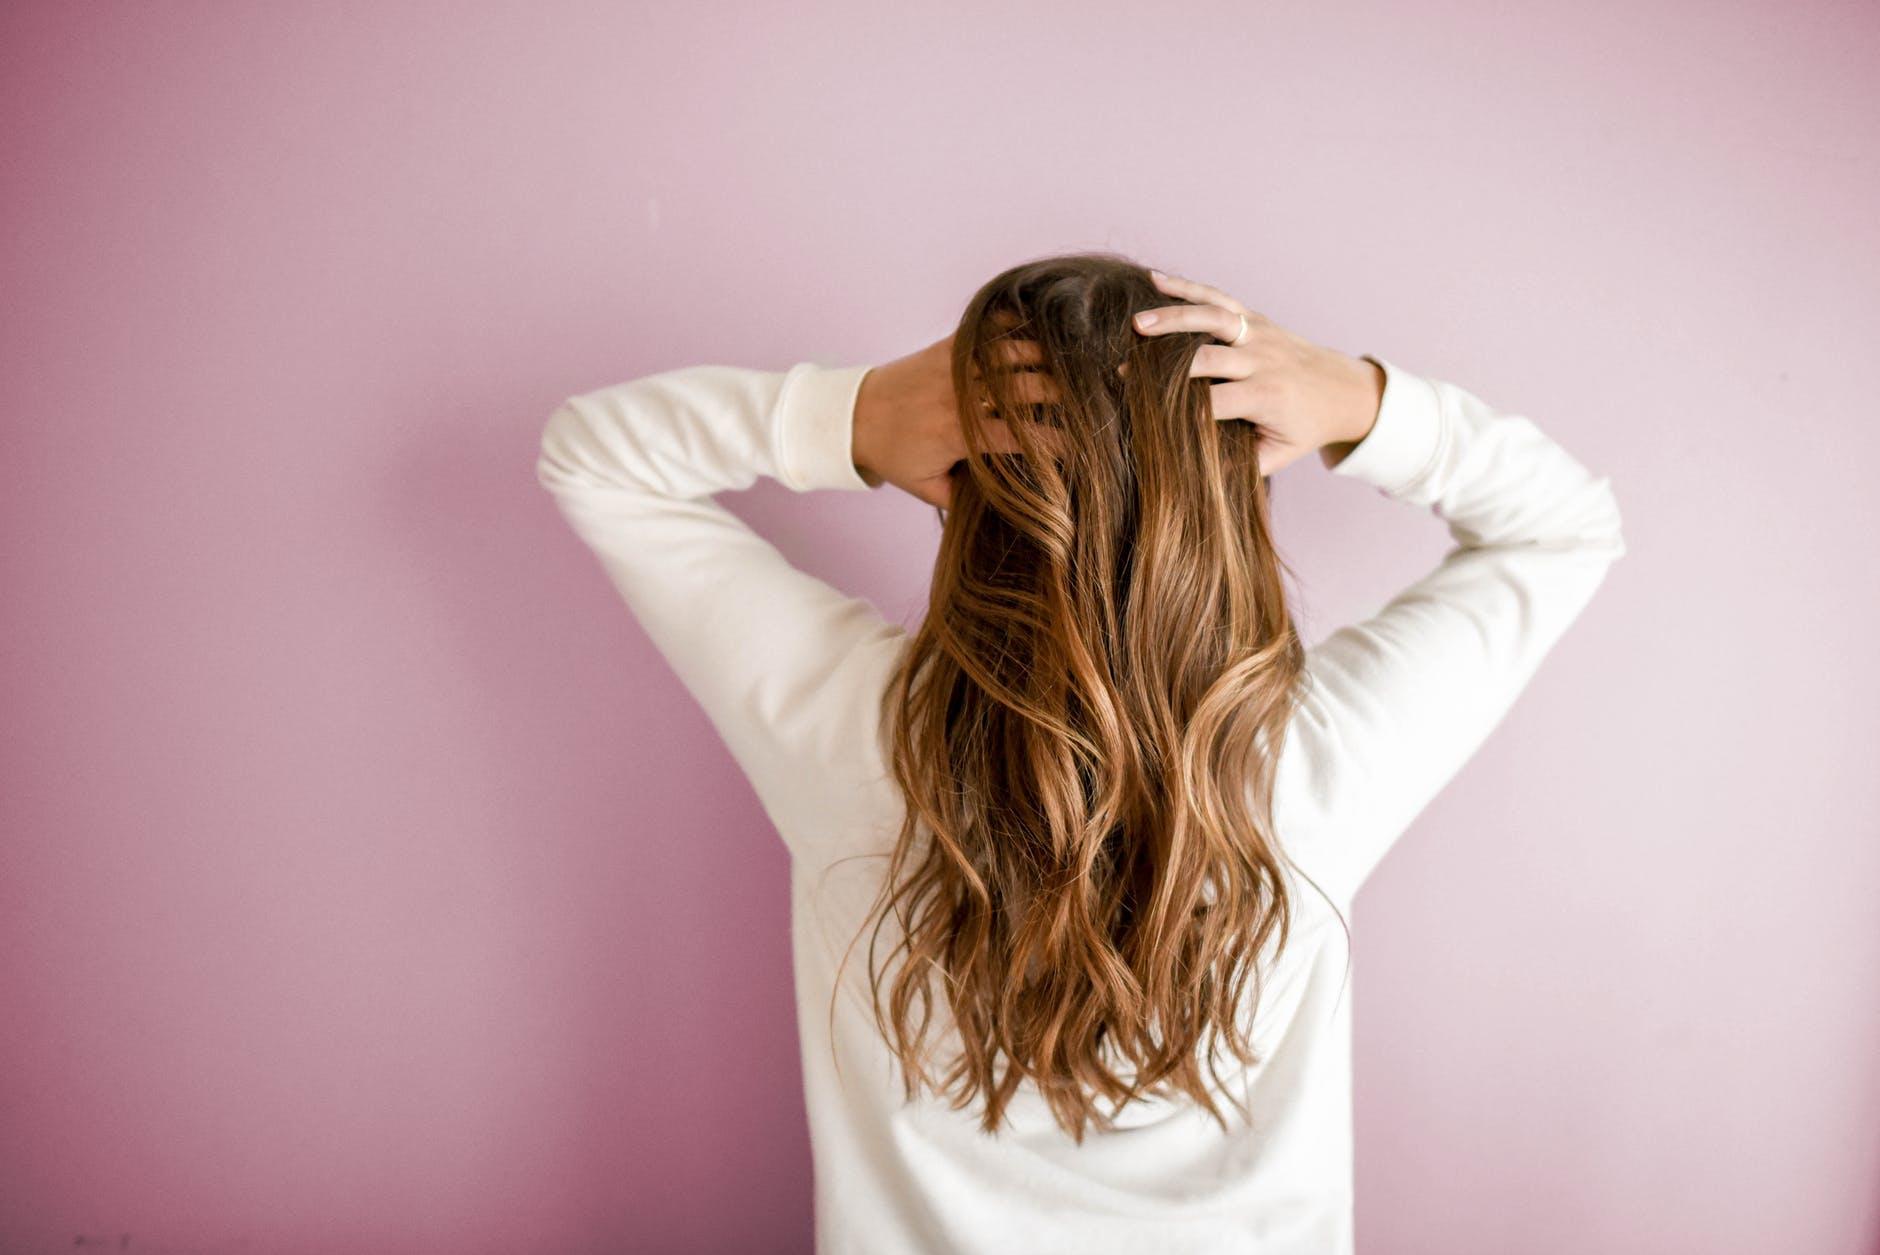 hair dry naturally